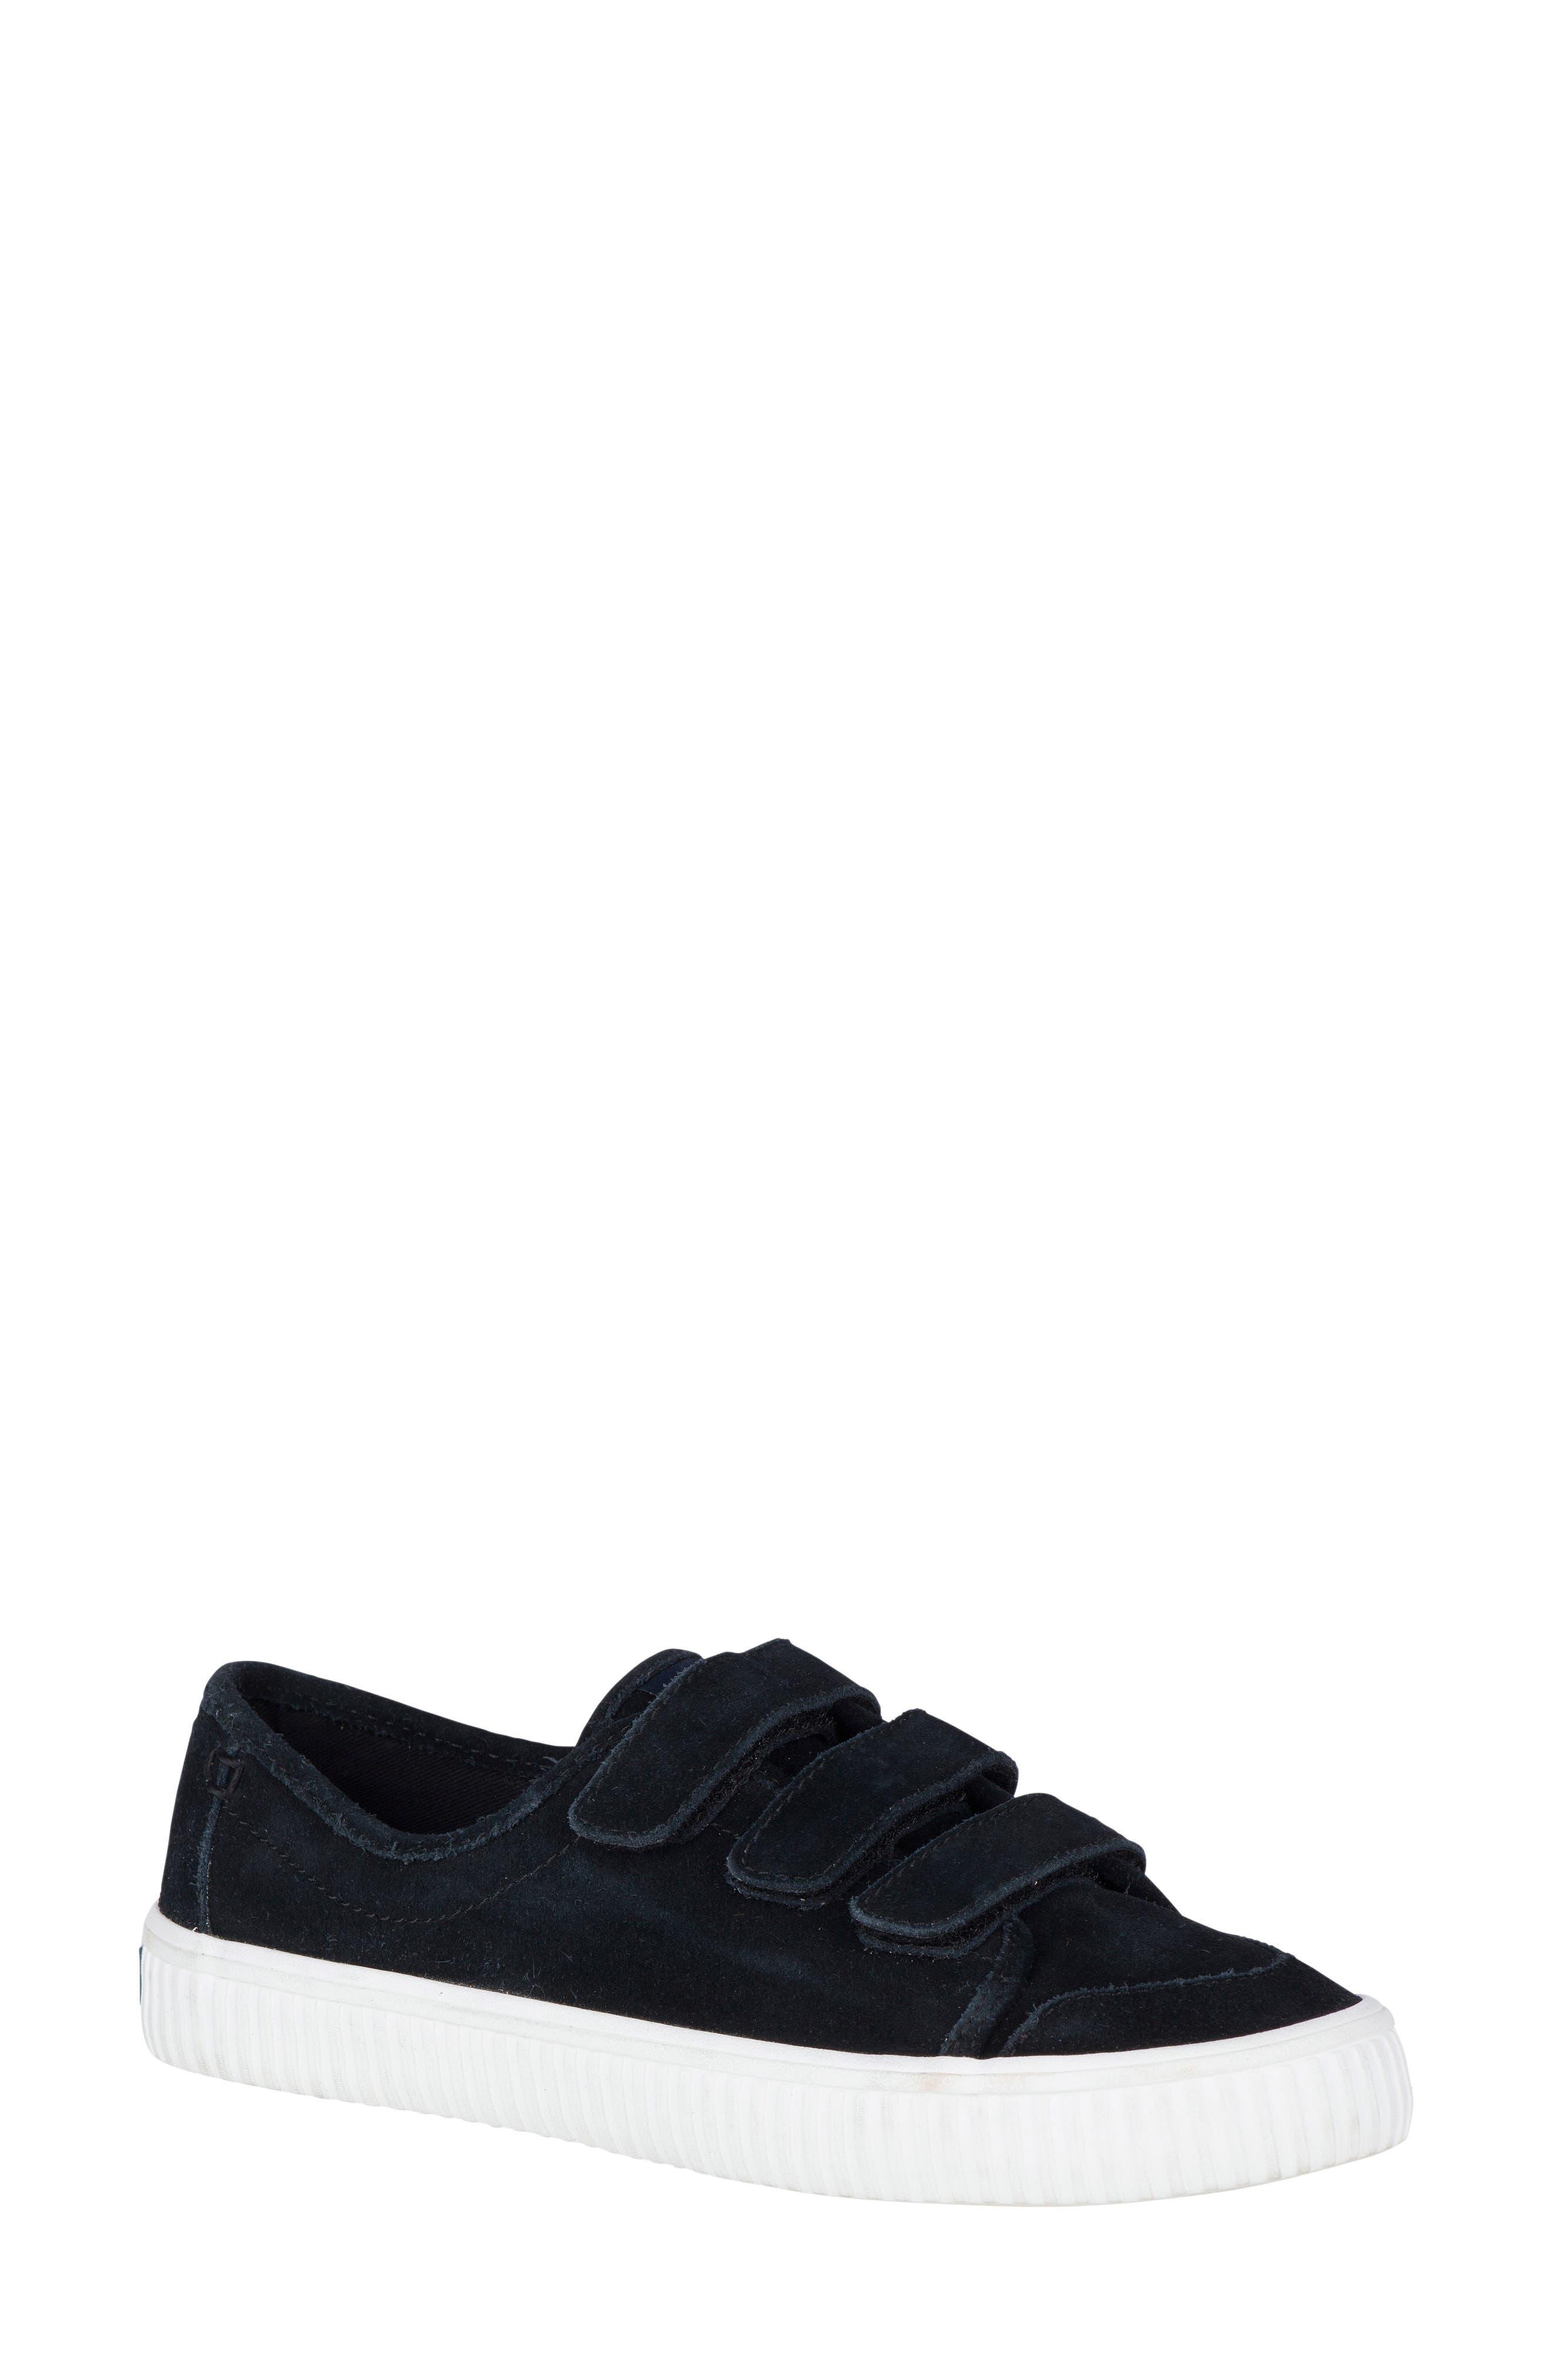 Creeper Sneaker,                             Main thumbnail 1, color,                             Black Suede